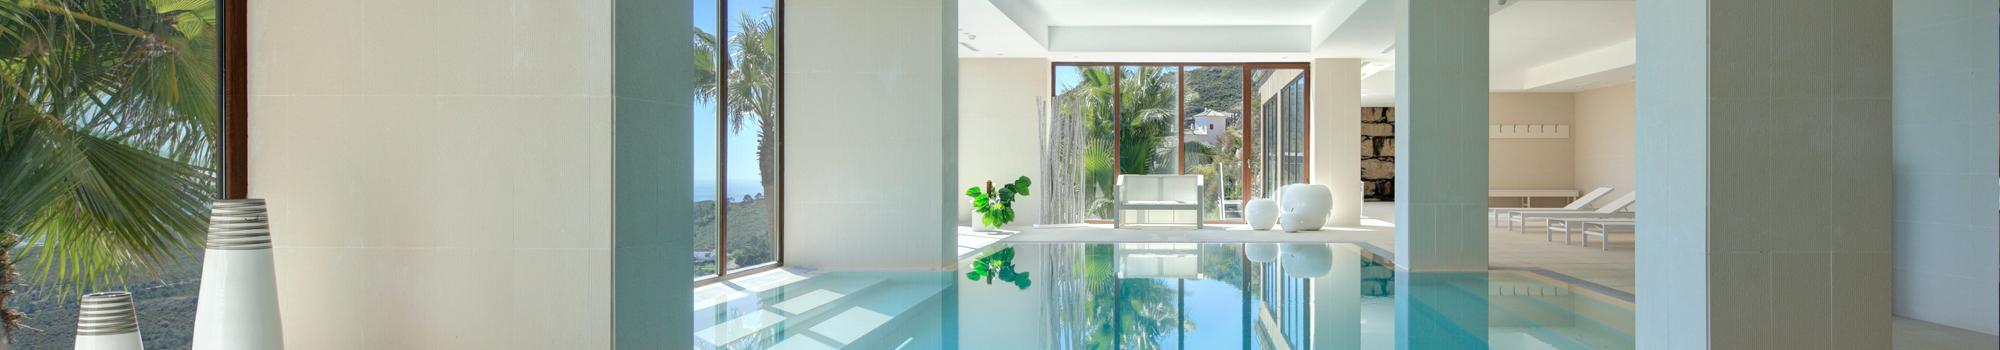 Benahavis Luxury Villas – REDUCED by 40% !!!